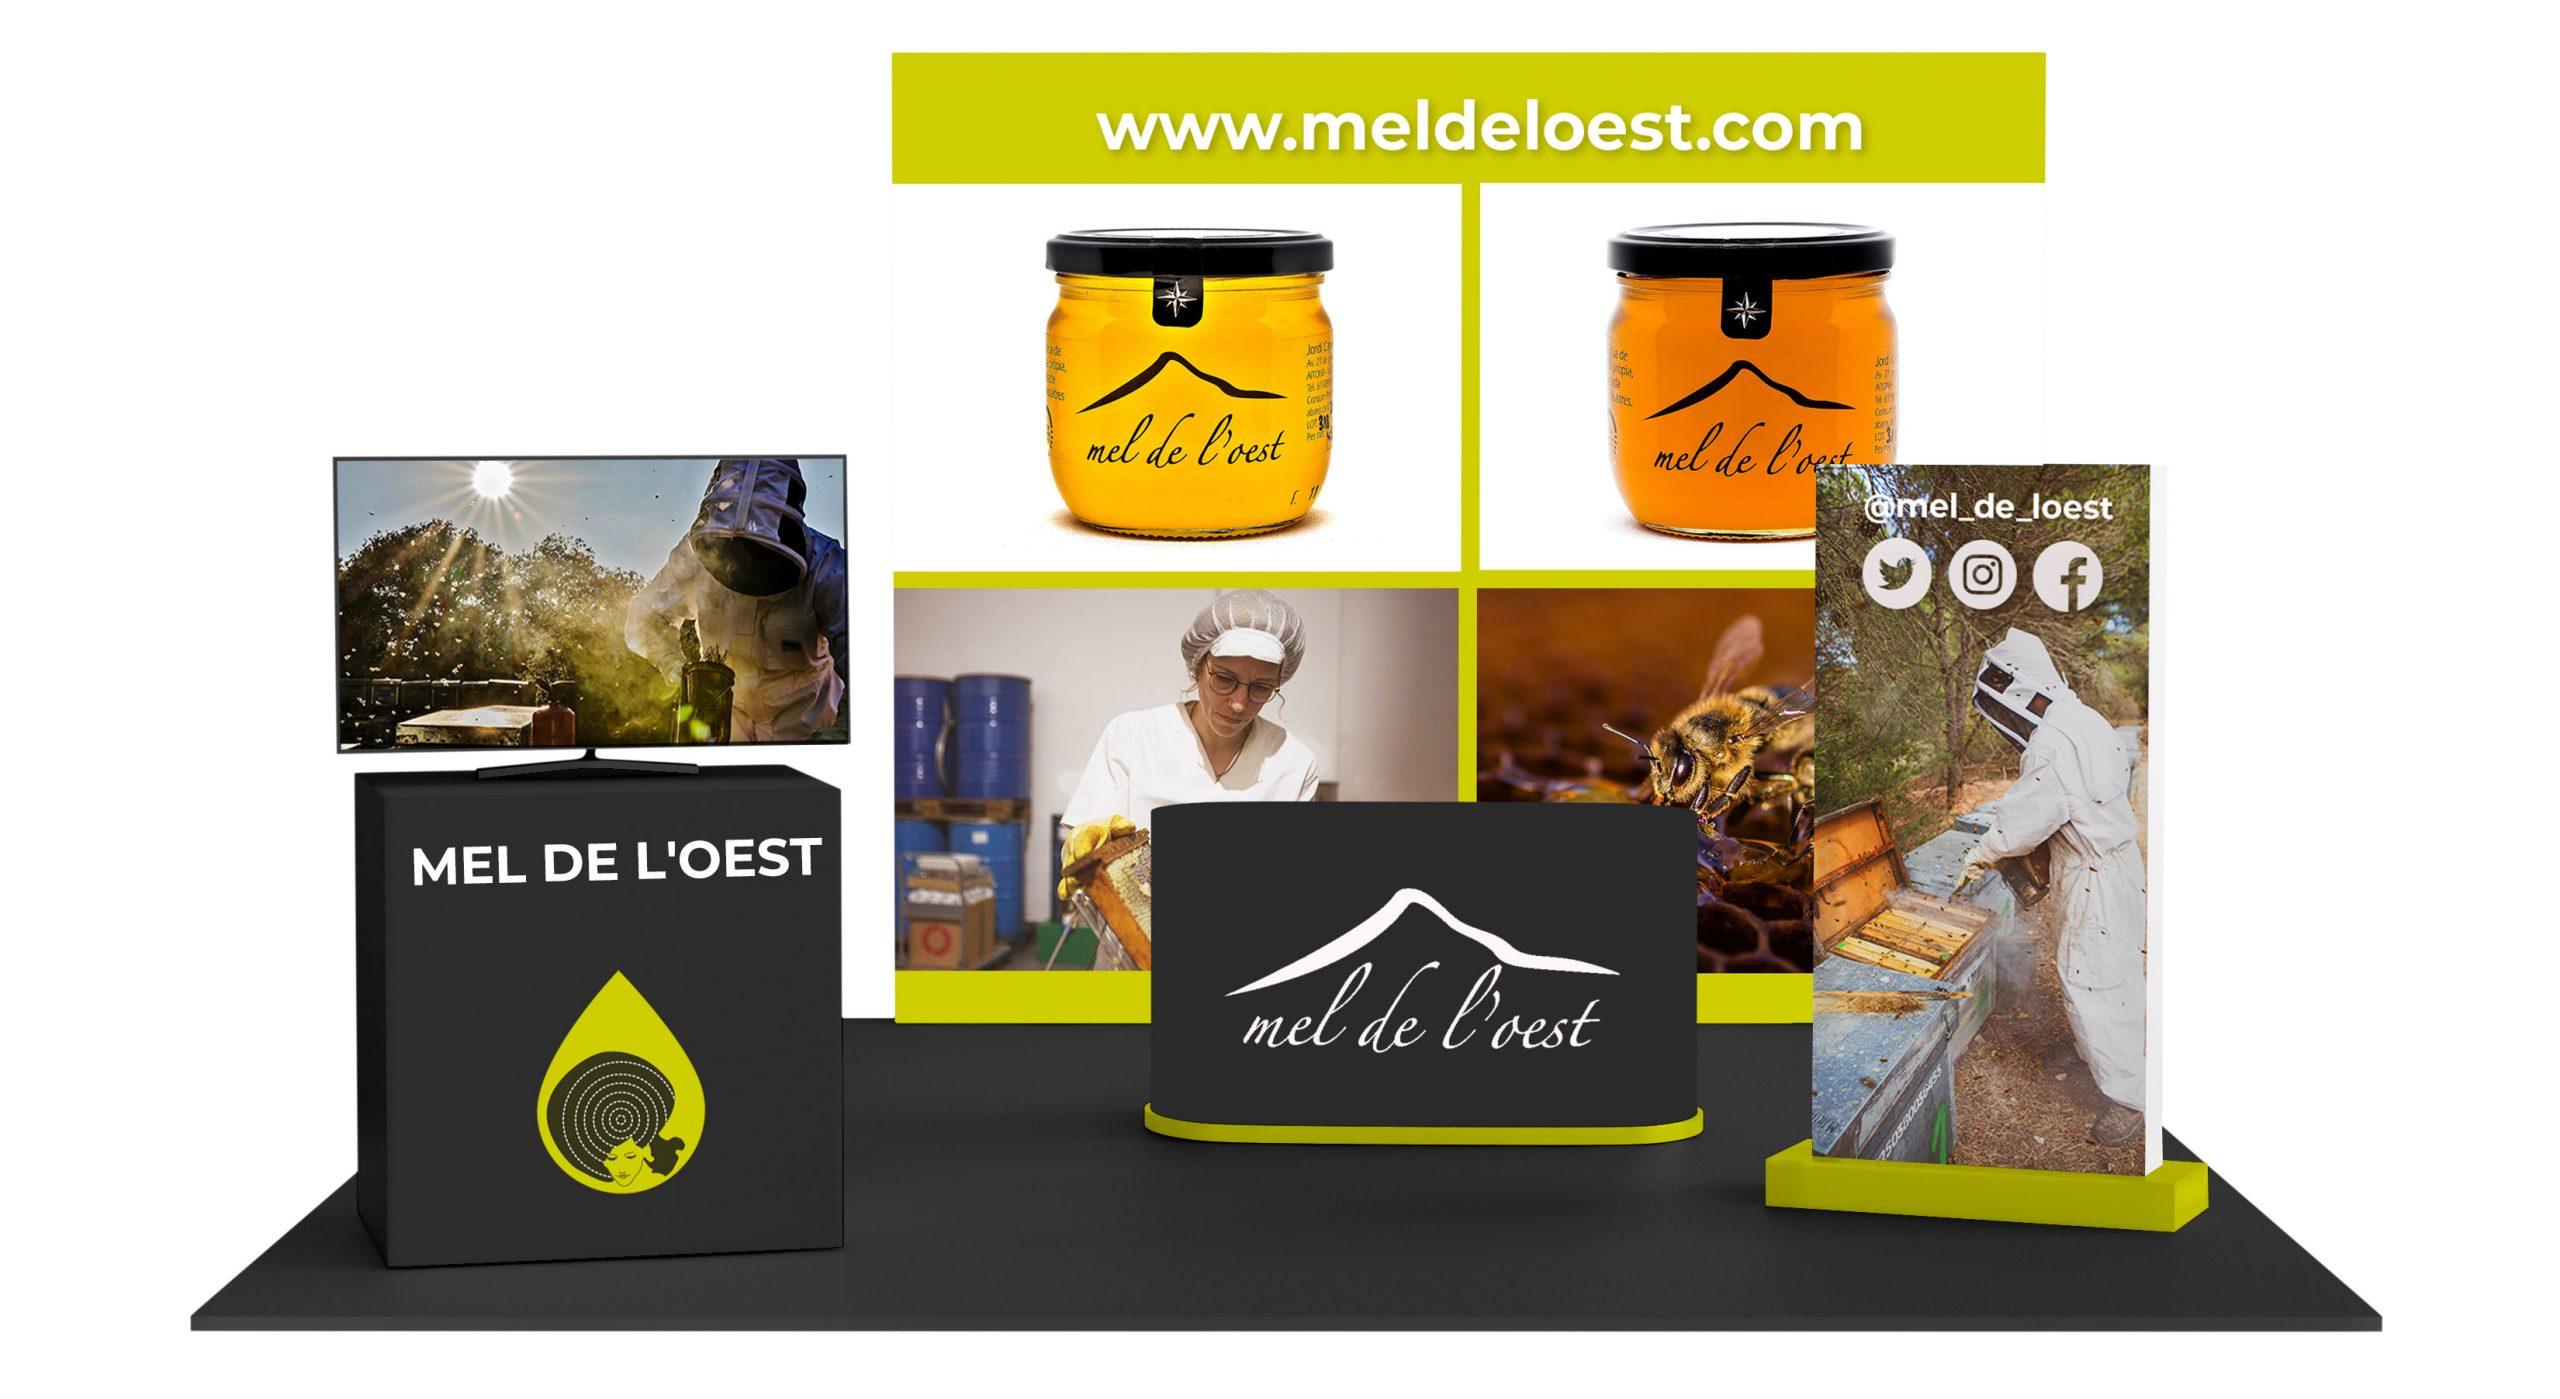 Mel Oest